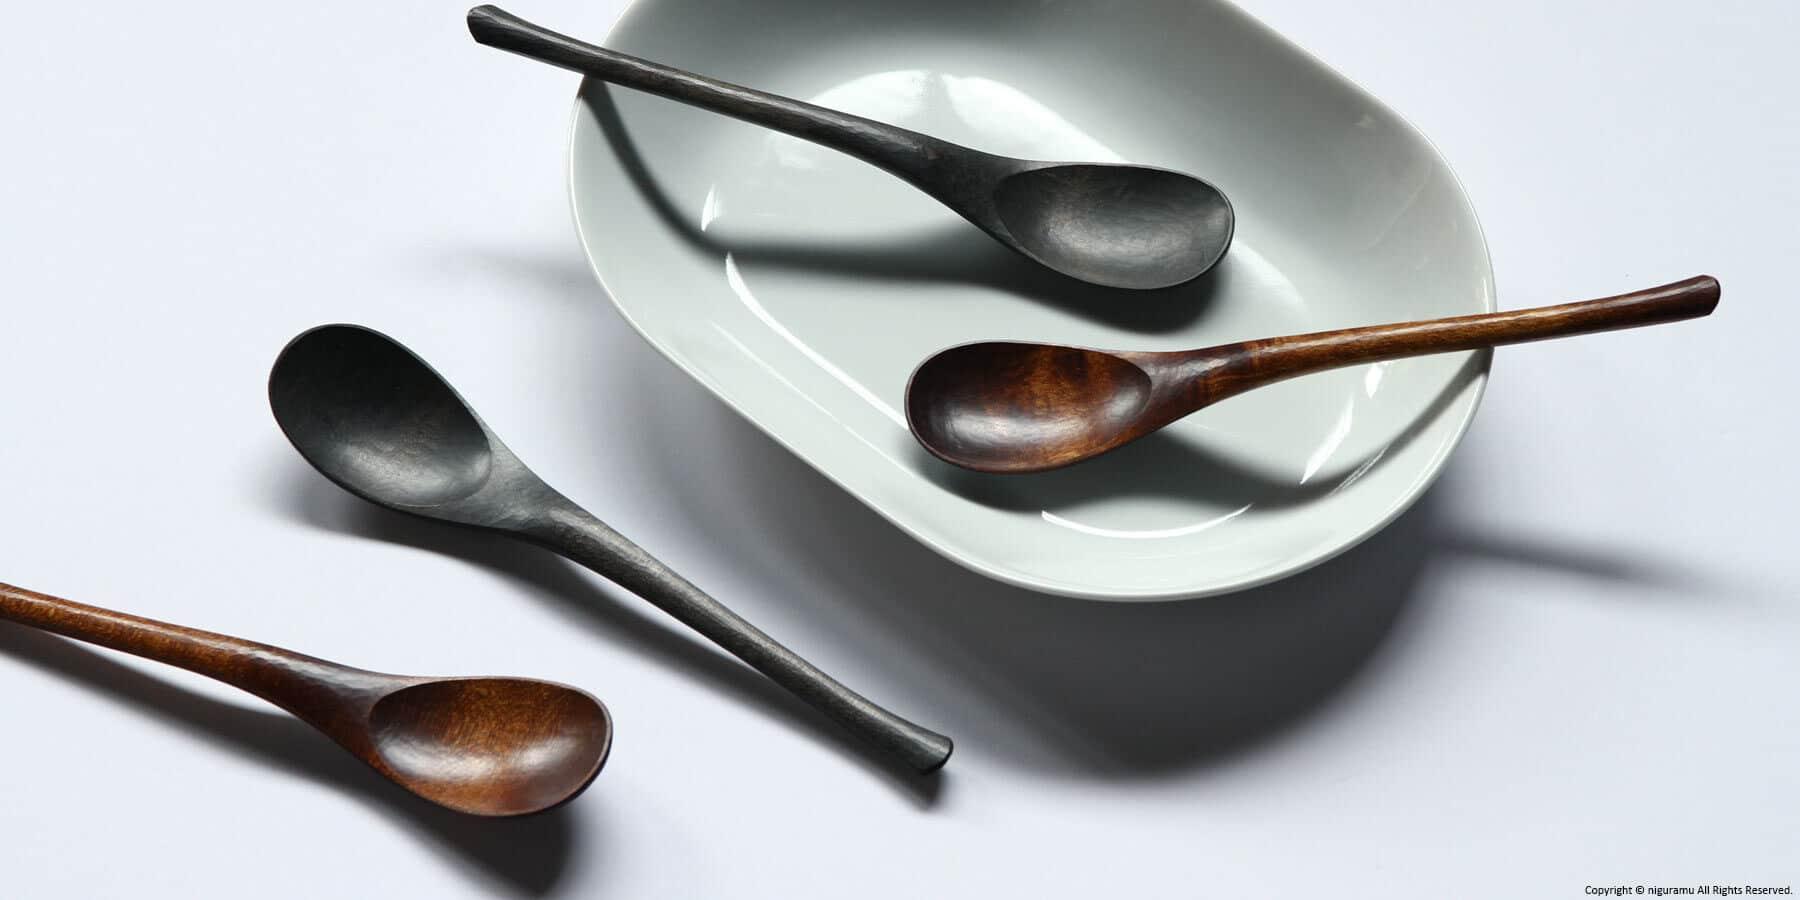 Wooden Japanese spoon / Urushi